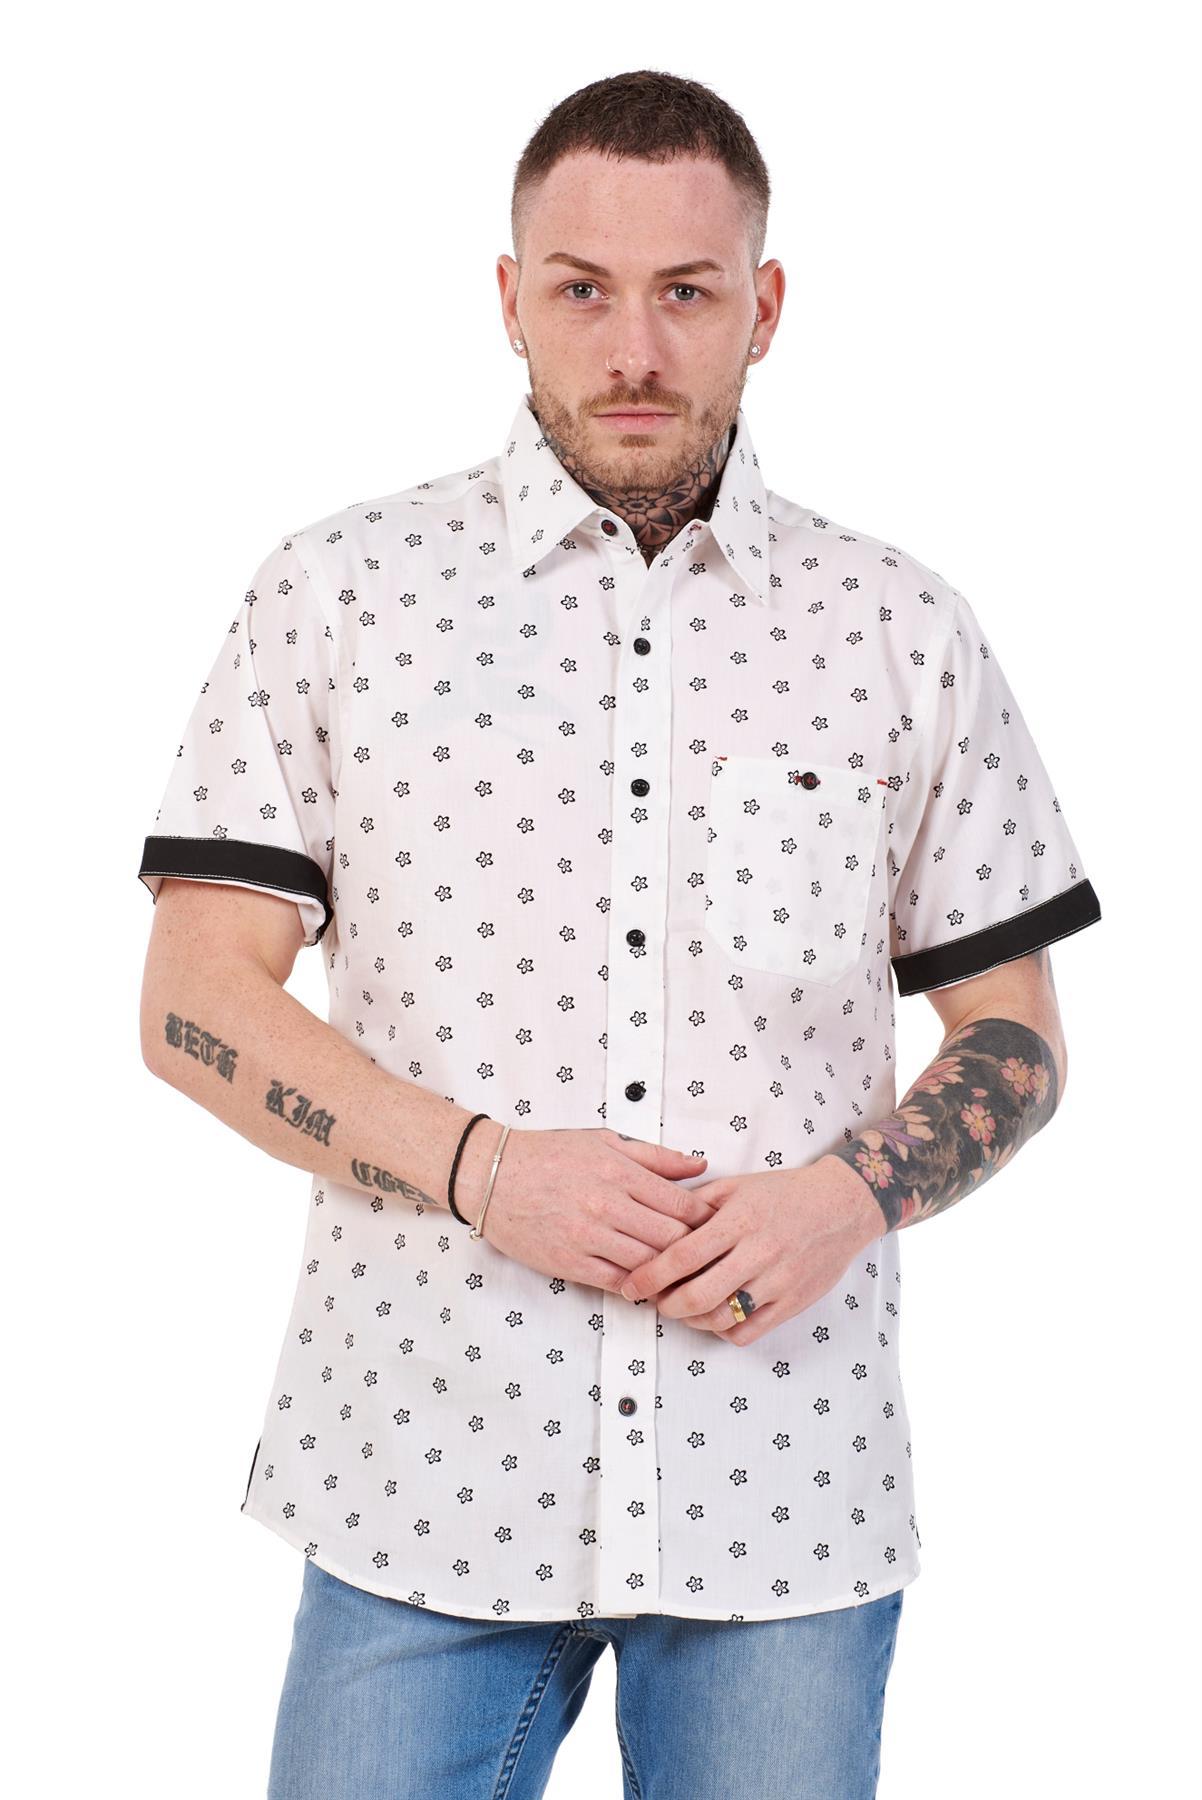 Mens-100-Cotton-Printed-Shirt-Short-Sleeve-Regular-Big-Size-Casual-Top-M-to-5XL thumbnail 18